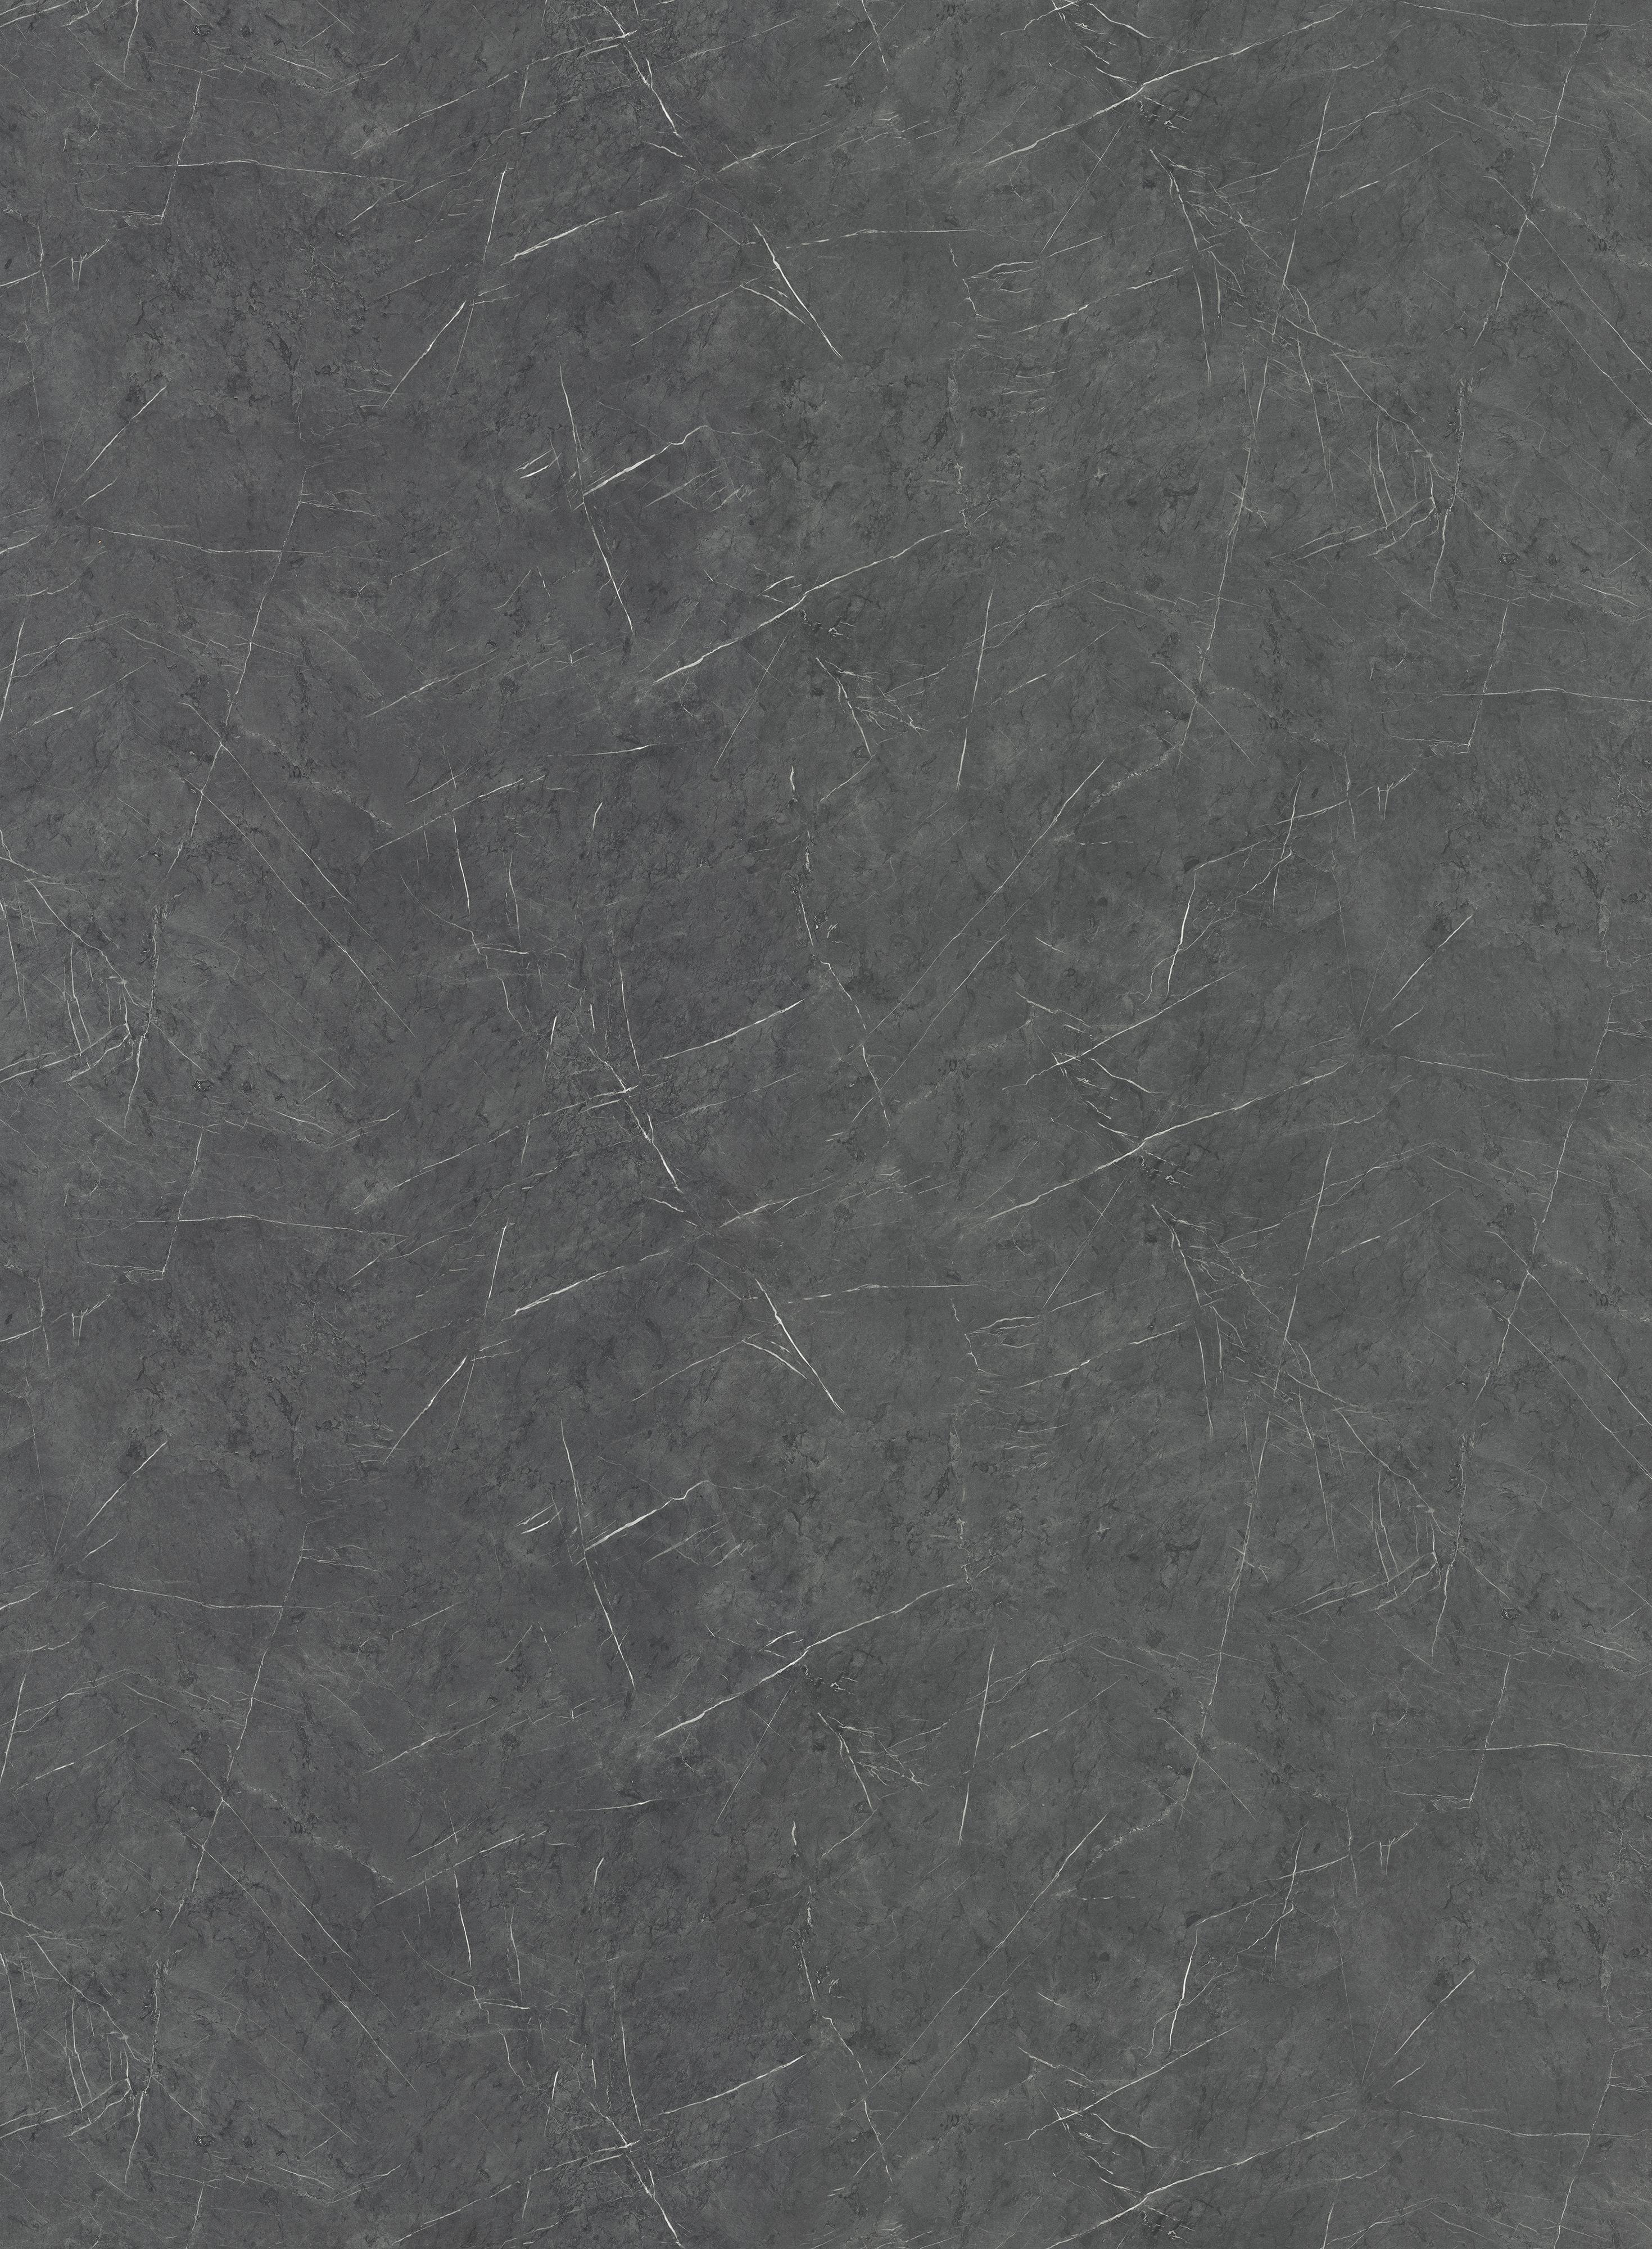 DecoLegno FC19 Talco, hele plaat afb. 2800x2070m/Tekenprogramma